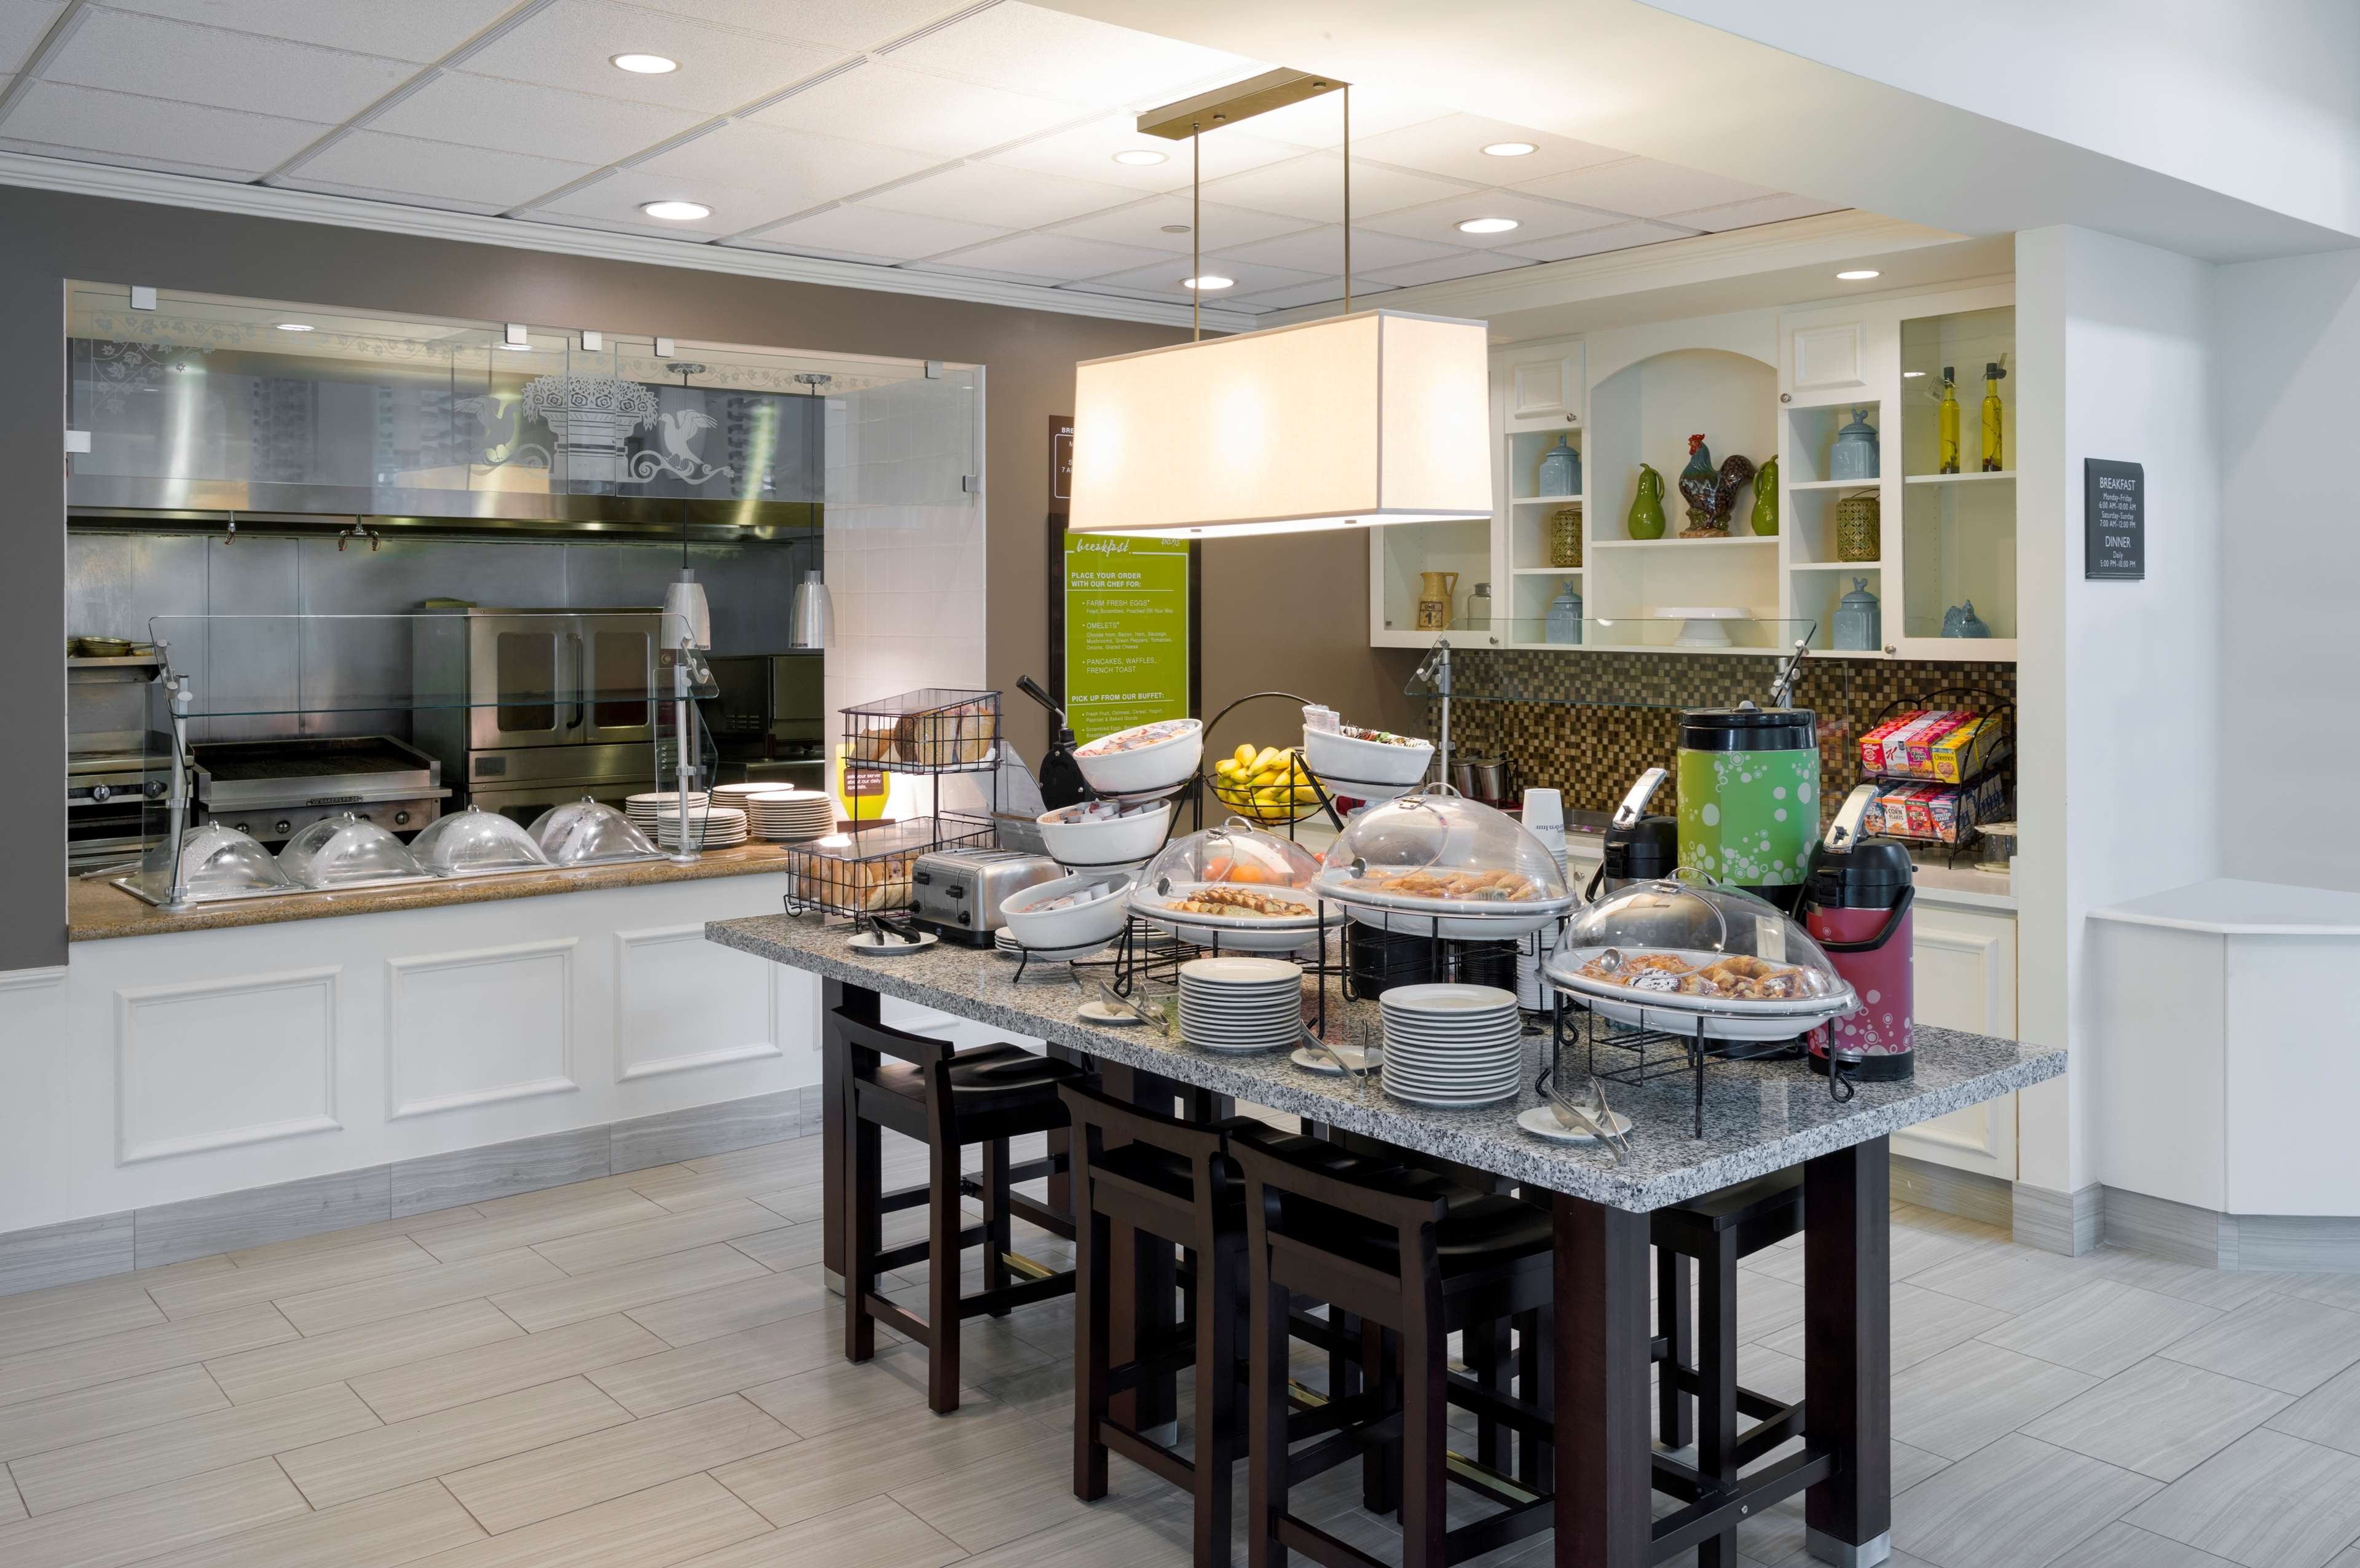 Hilton Garden Inn Hartford South/Glastonbury image 14